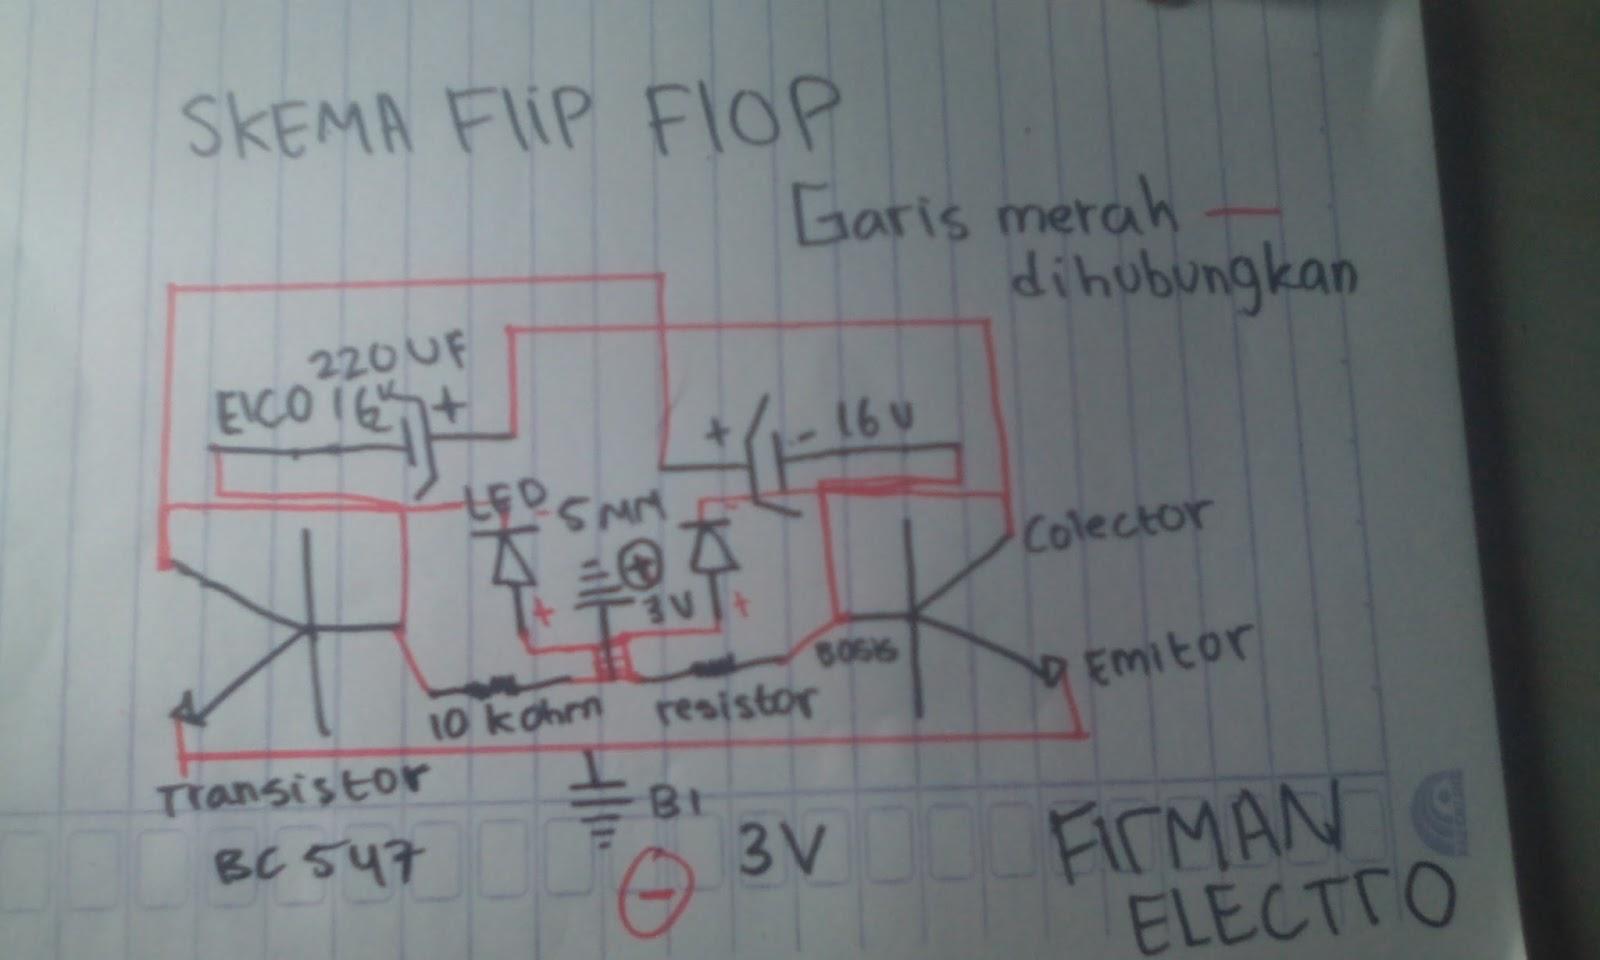 Cara Membuat Lampu Led Flip Flop 3v Tanpa Jalur Pcb Firman Electro